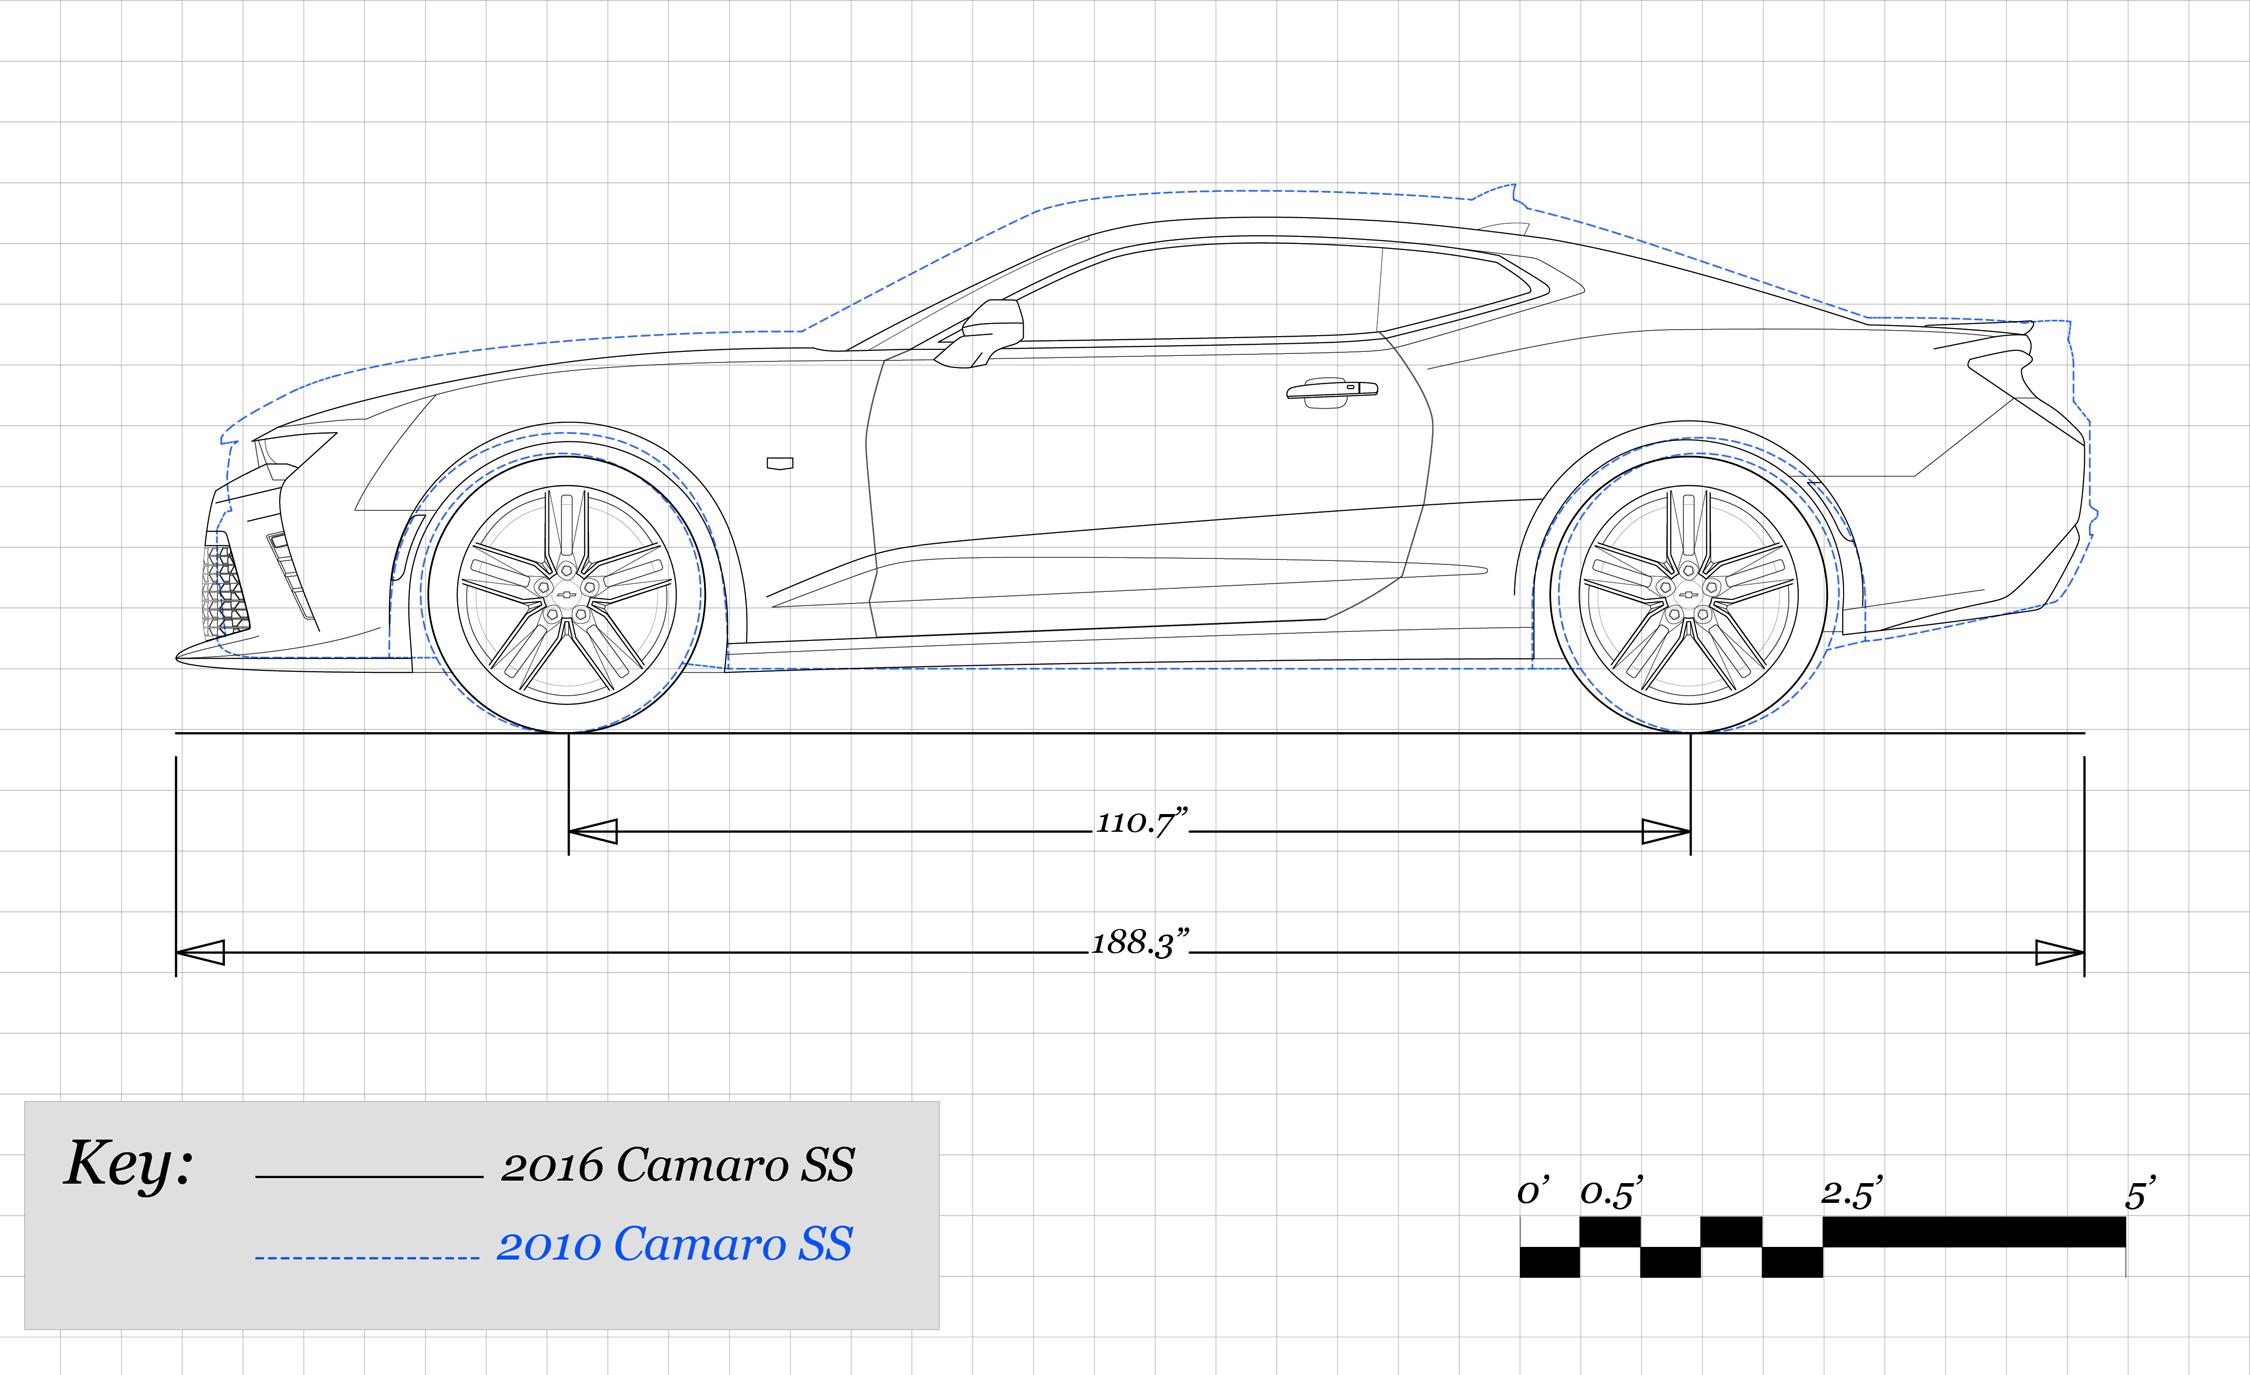 Drawn vehicle camaro ss We That Car every So